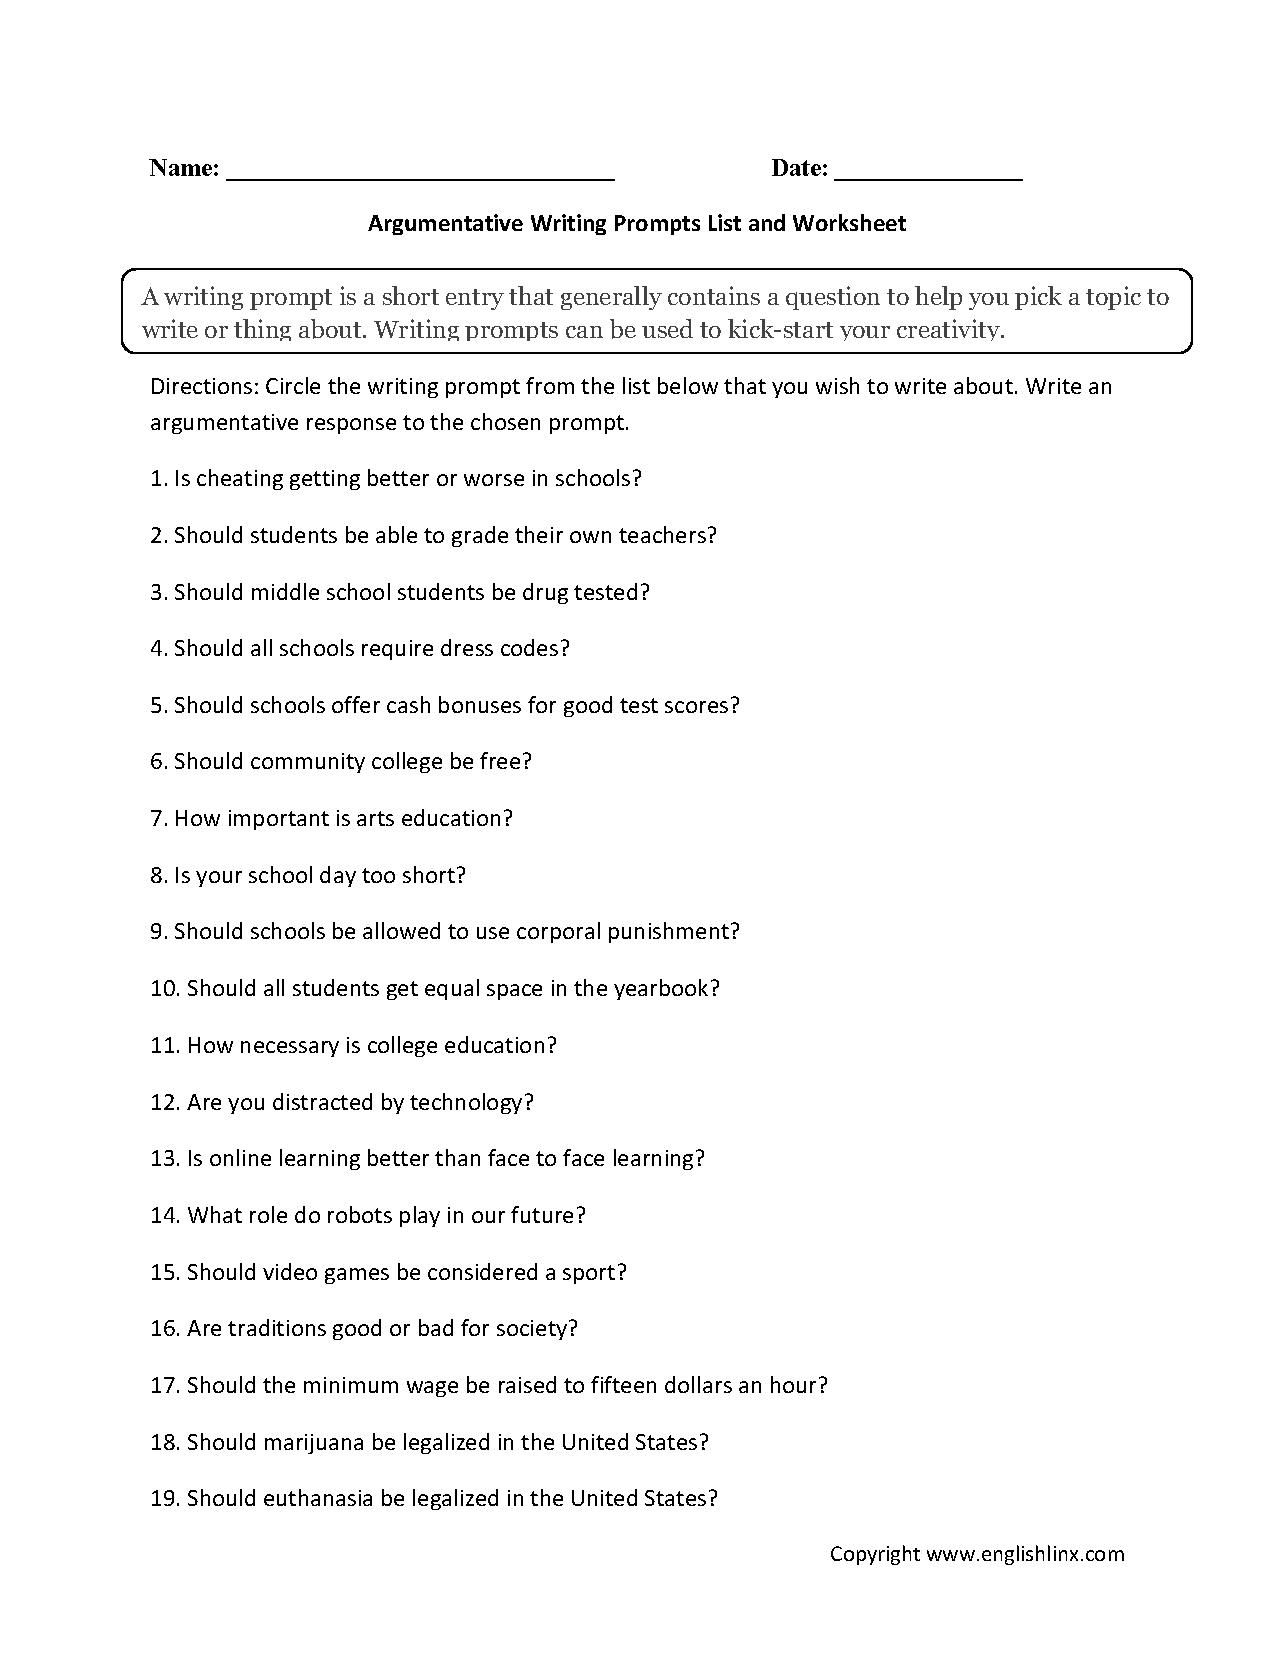 Writing Prompt Worksheet Argumentative Prompts Good Essay Topic Sports